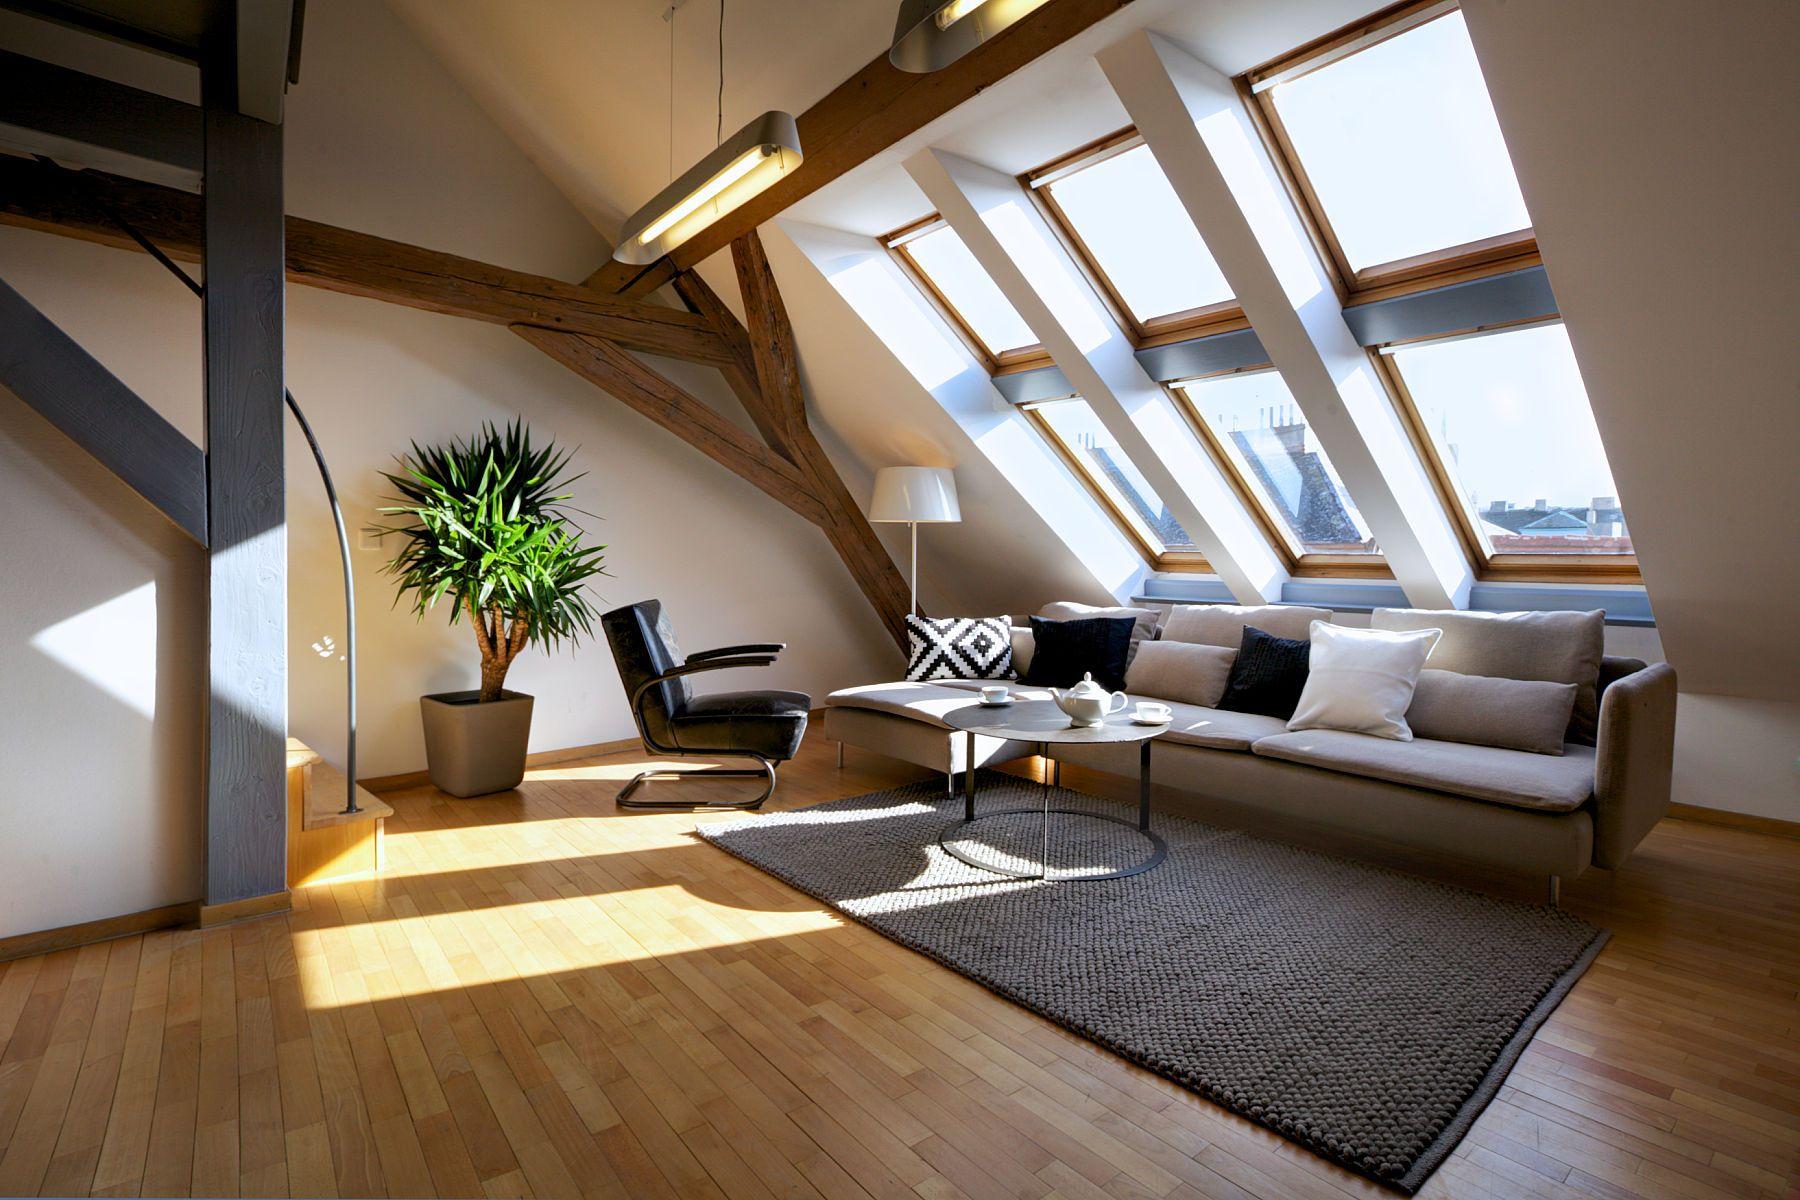 Loft apartment with natural light. Visit houseandleisure